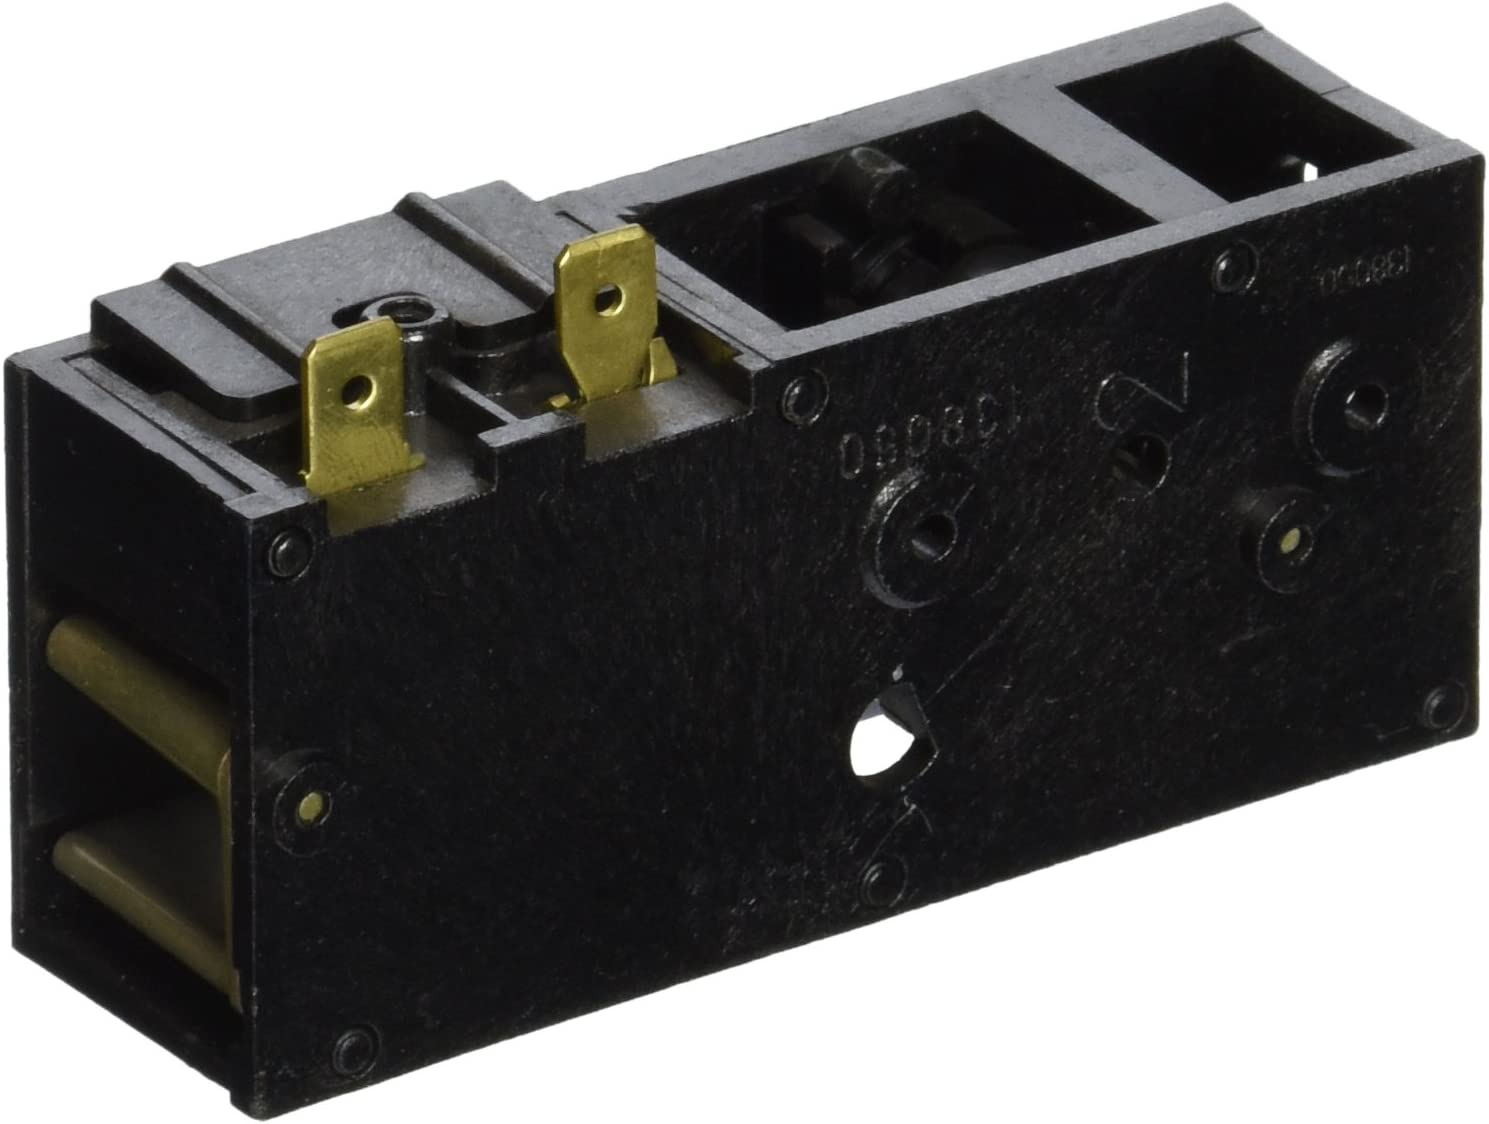 GENUINE Frigidaire 327362201 Dehumidifier Humidistat Unit